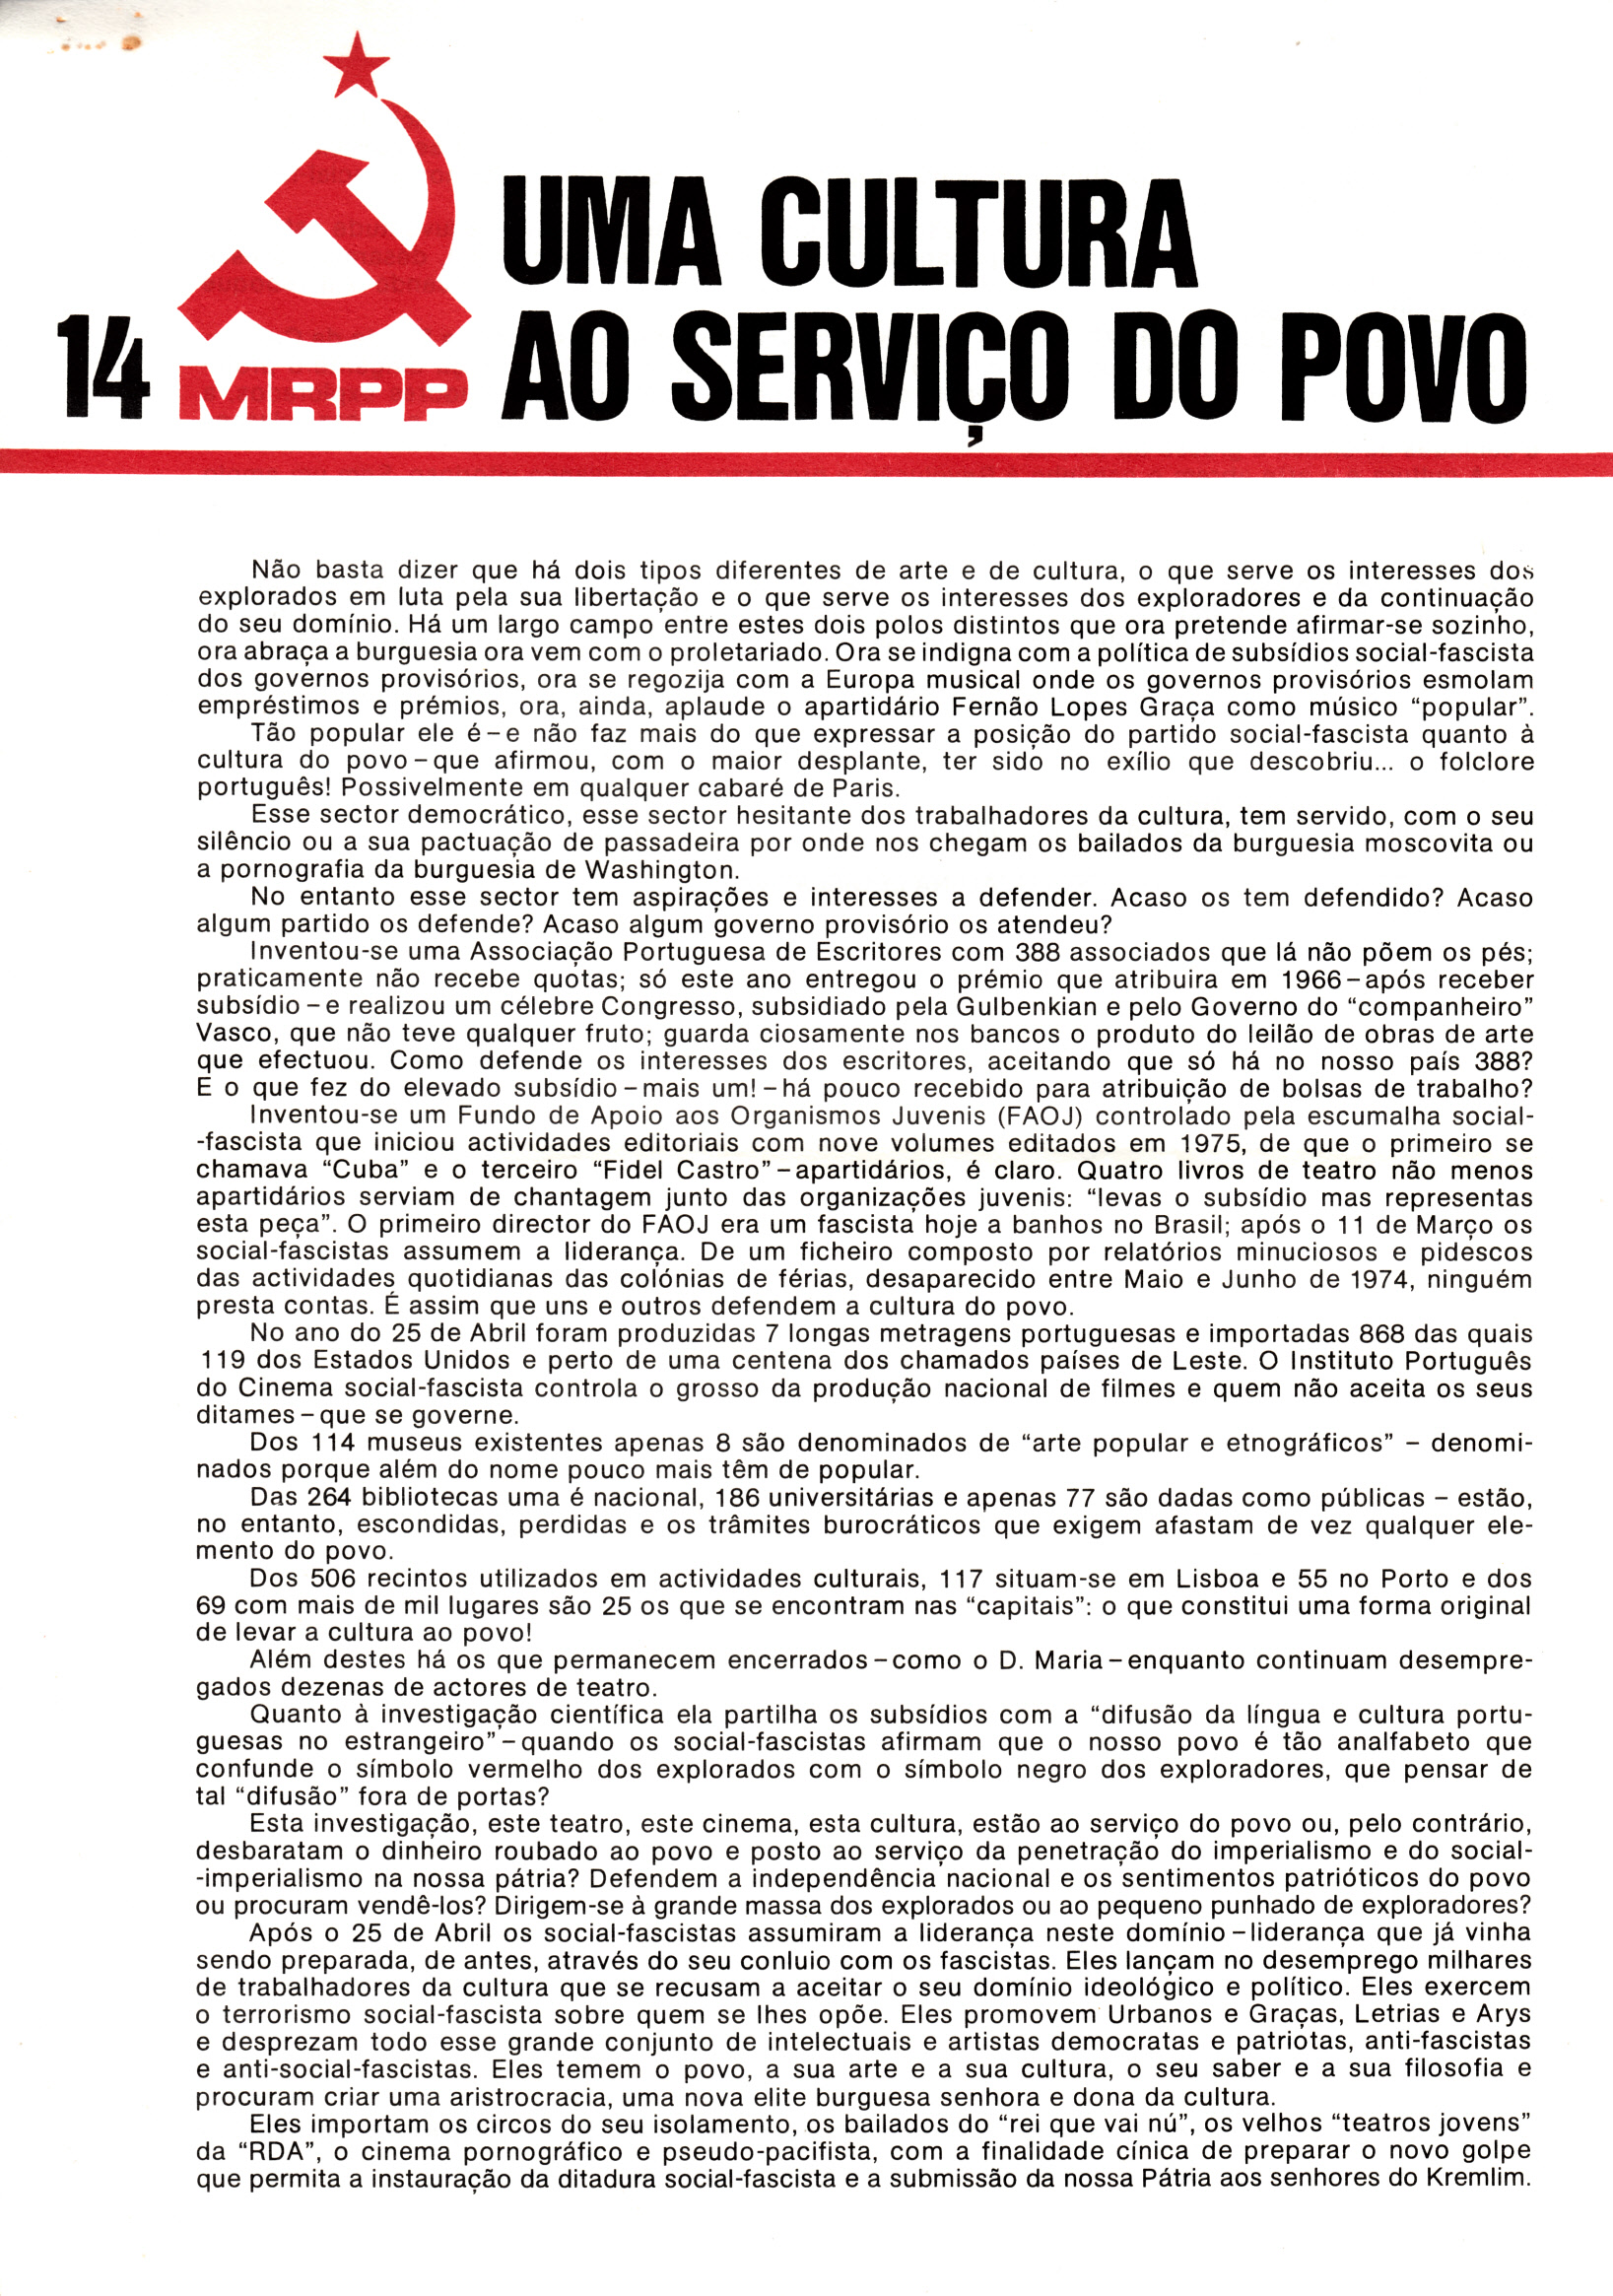 mrpp_1976_eleicao_programa_0027